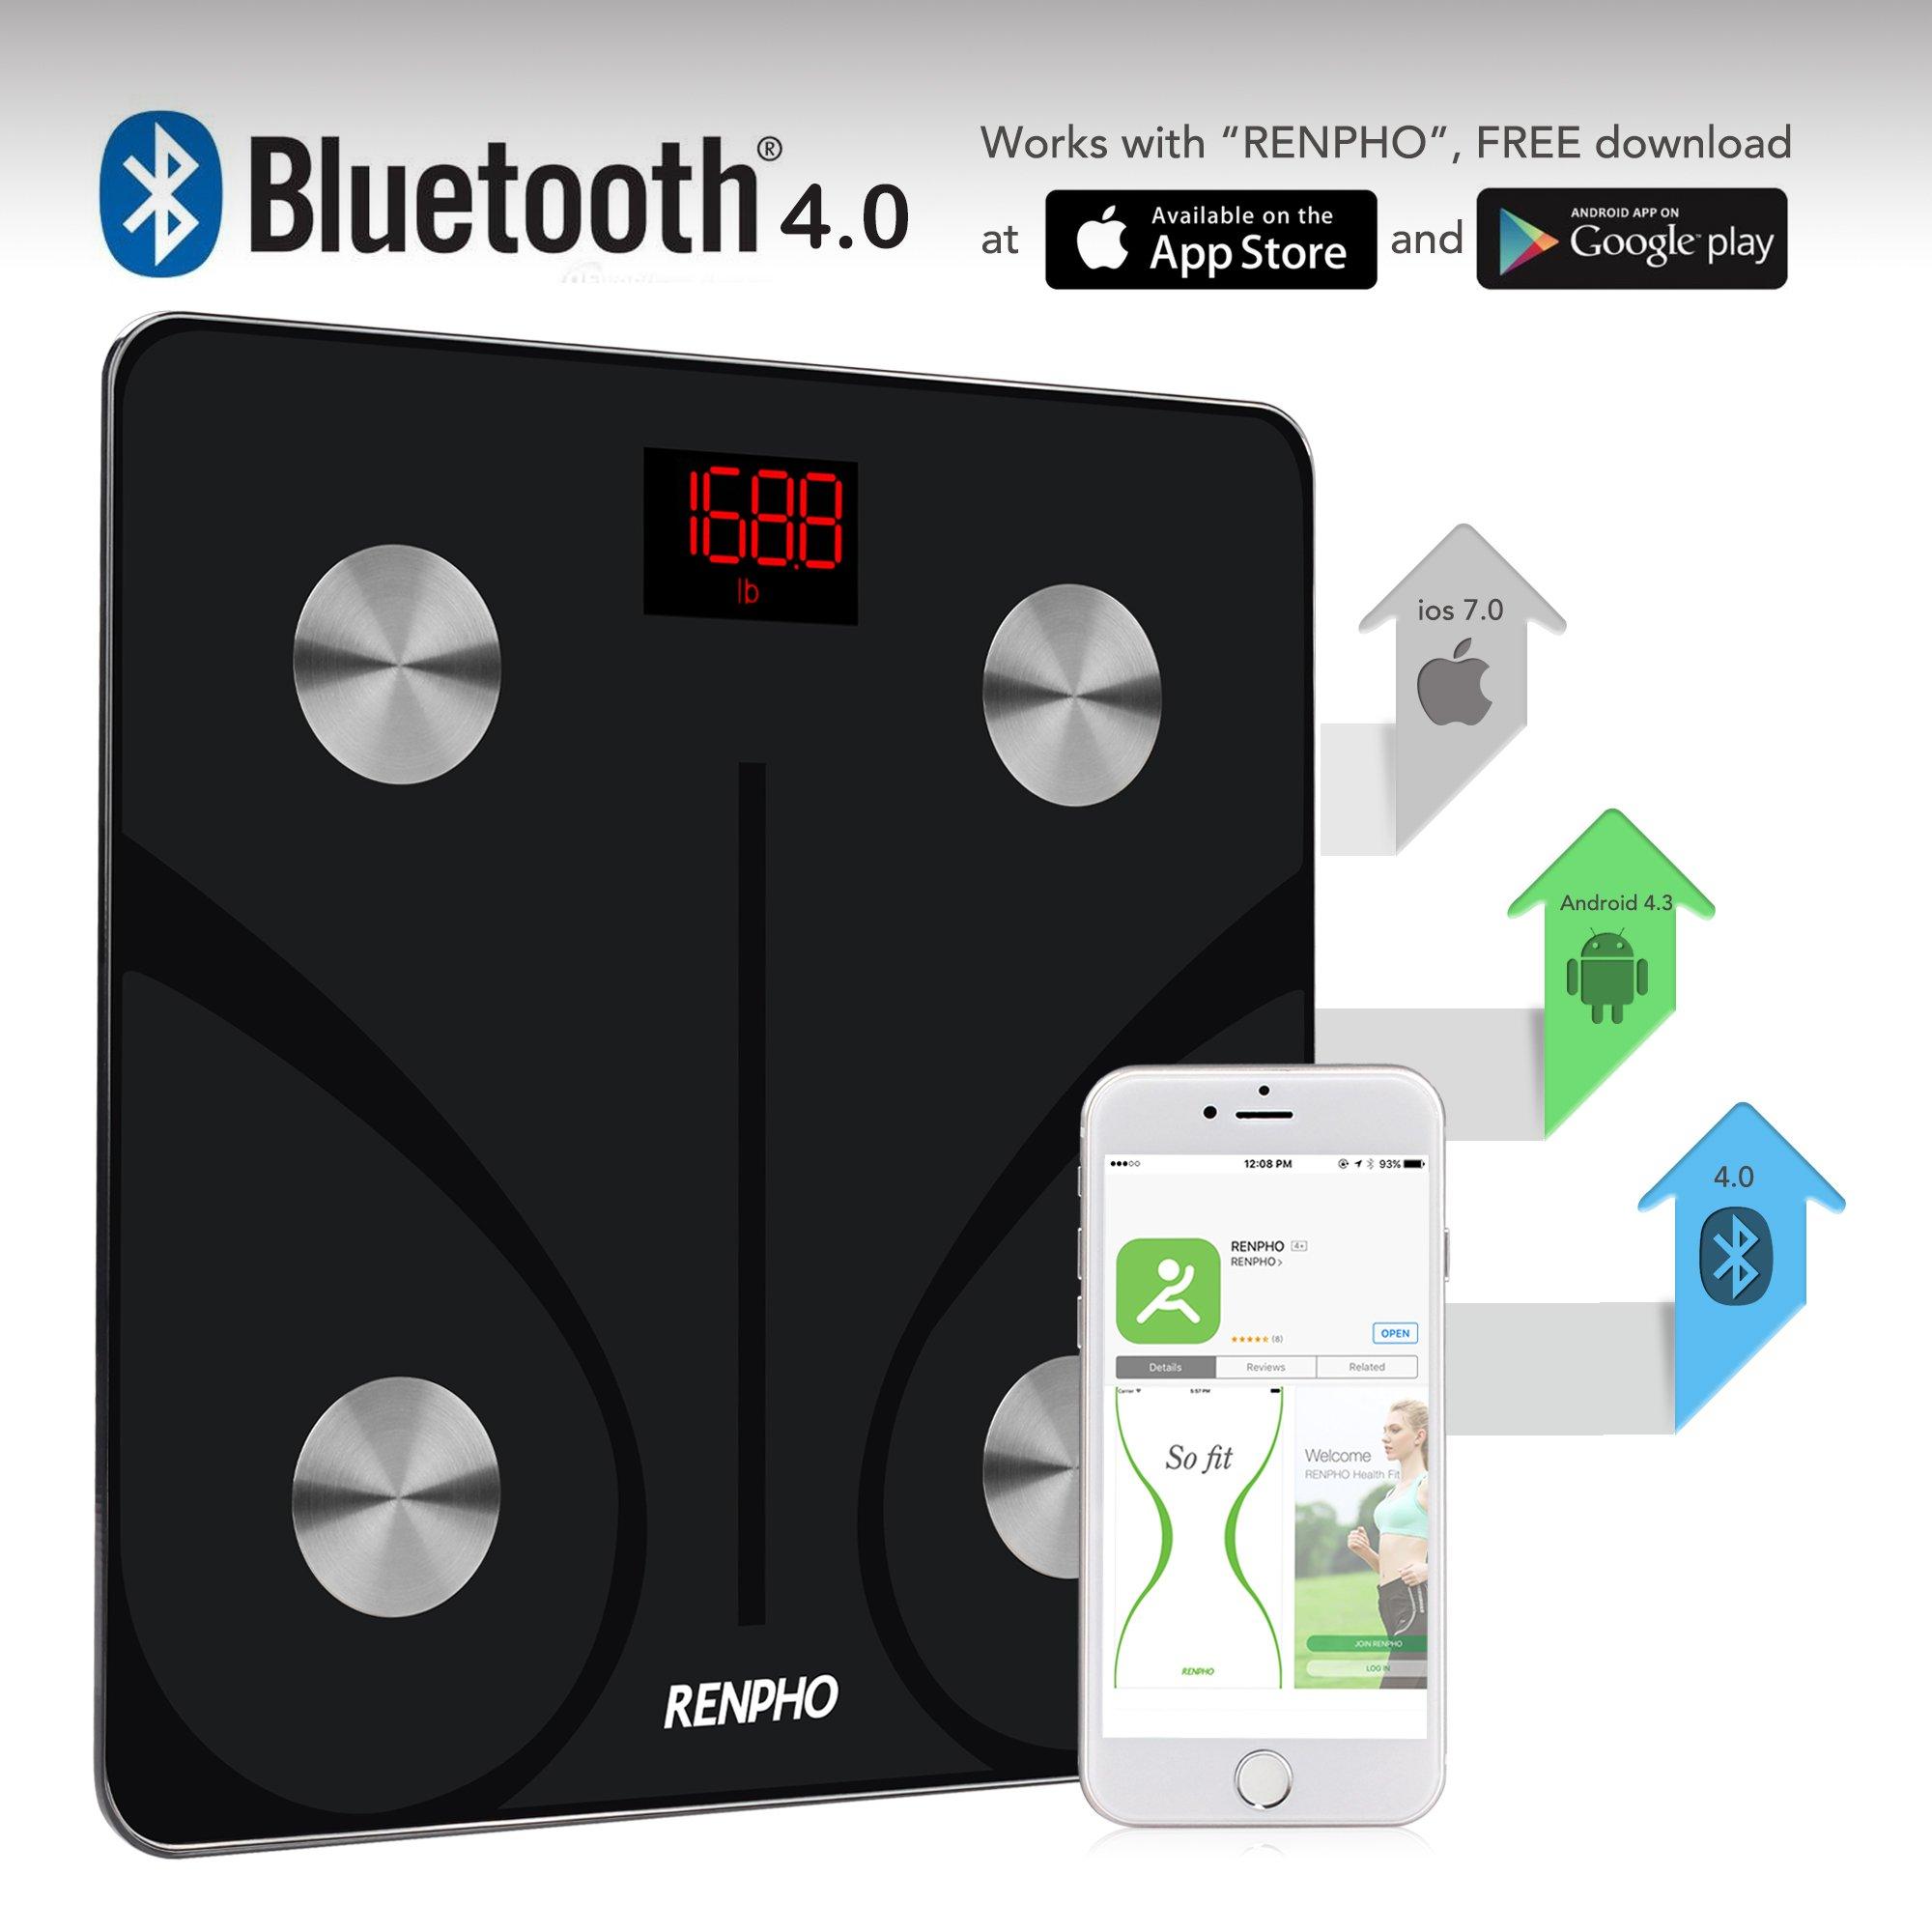 Bmi Bathroom Scale: RENPHO Bluetooth Body Fat Scale